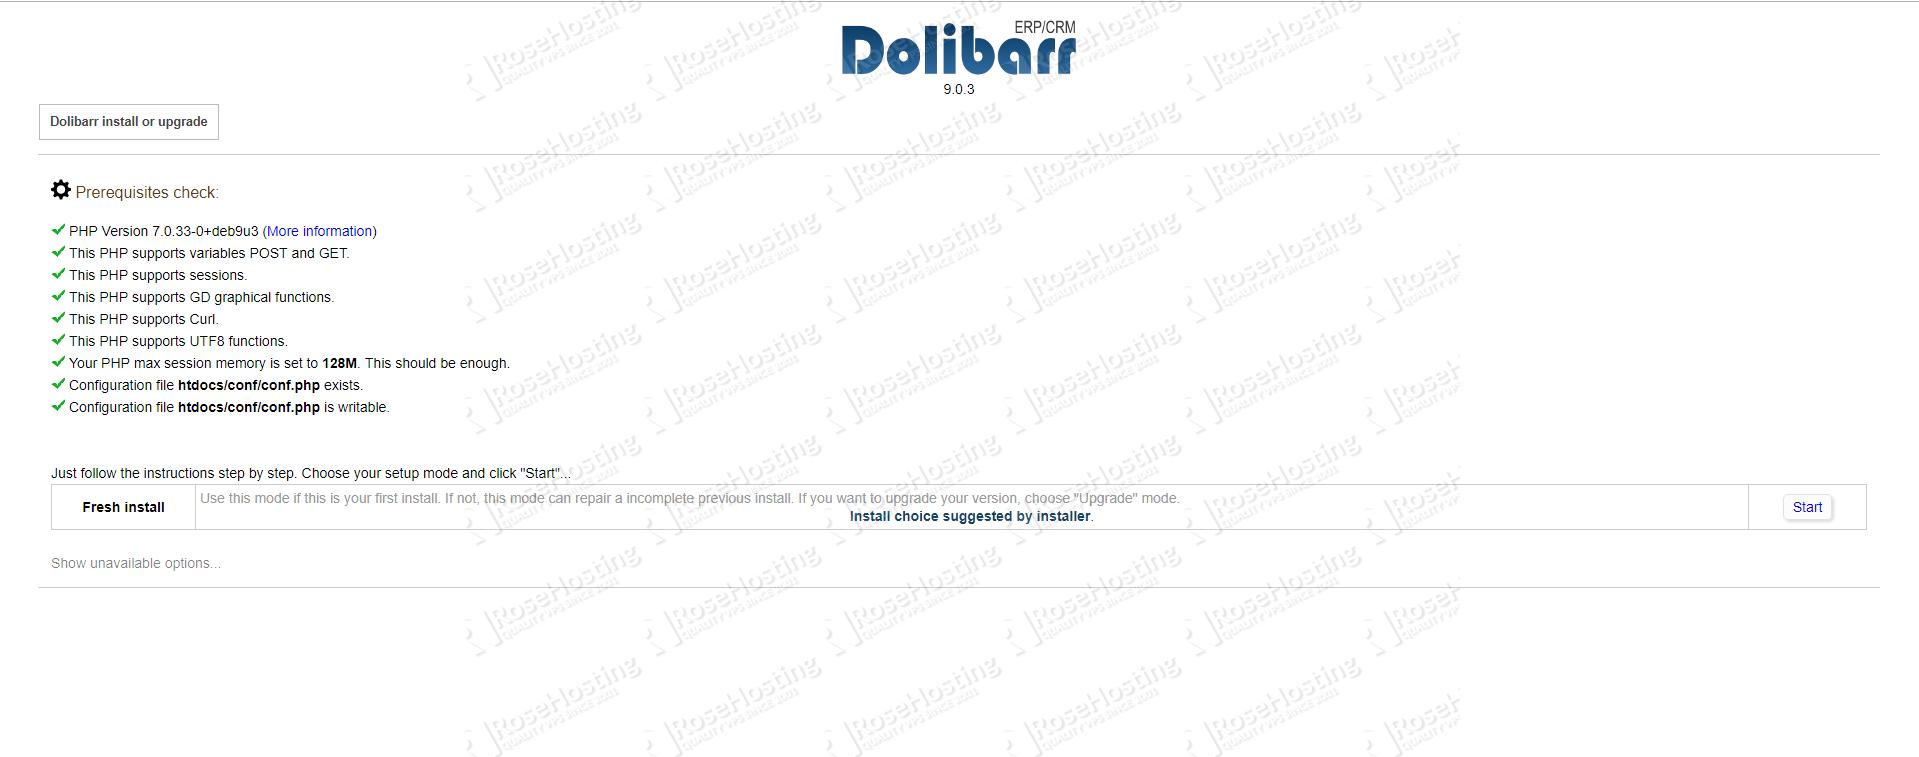 Dolibarr prerequisites checker